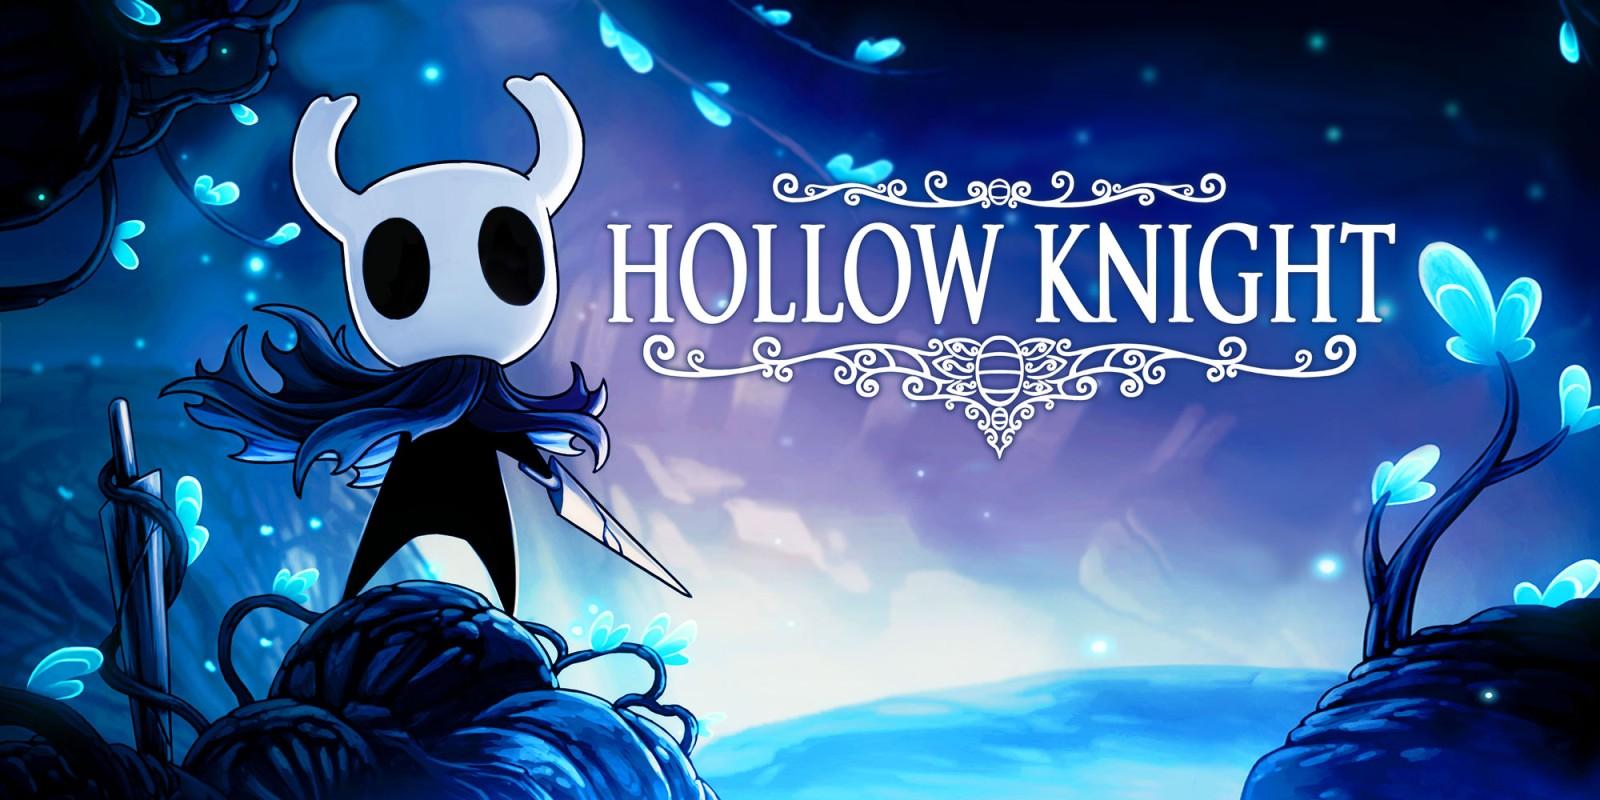 H2x1_WiiUDS_HollowKnight_image1600w.jpg